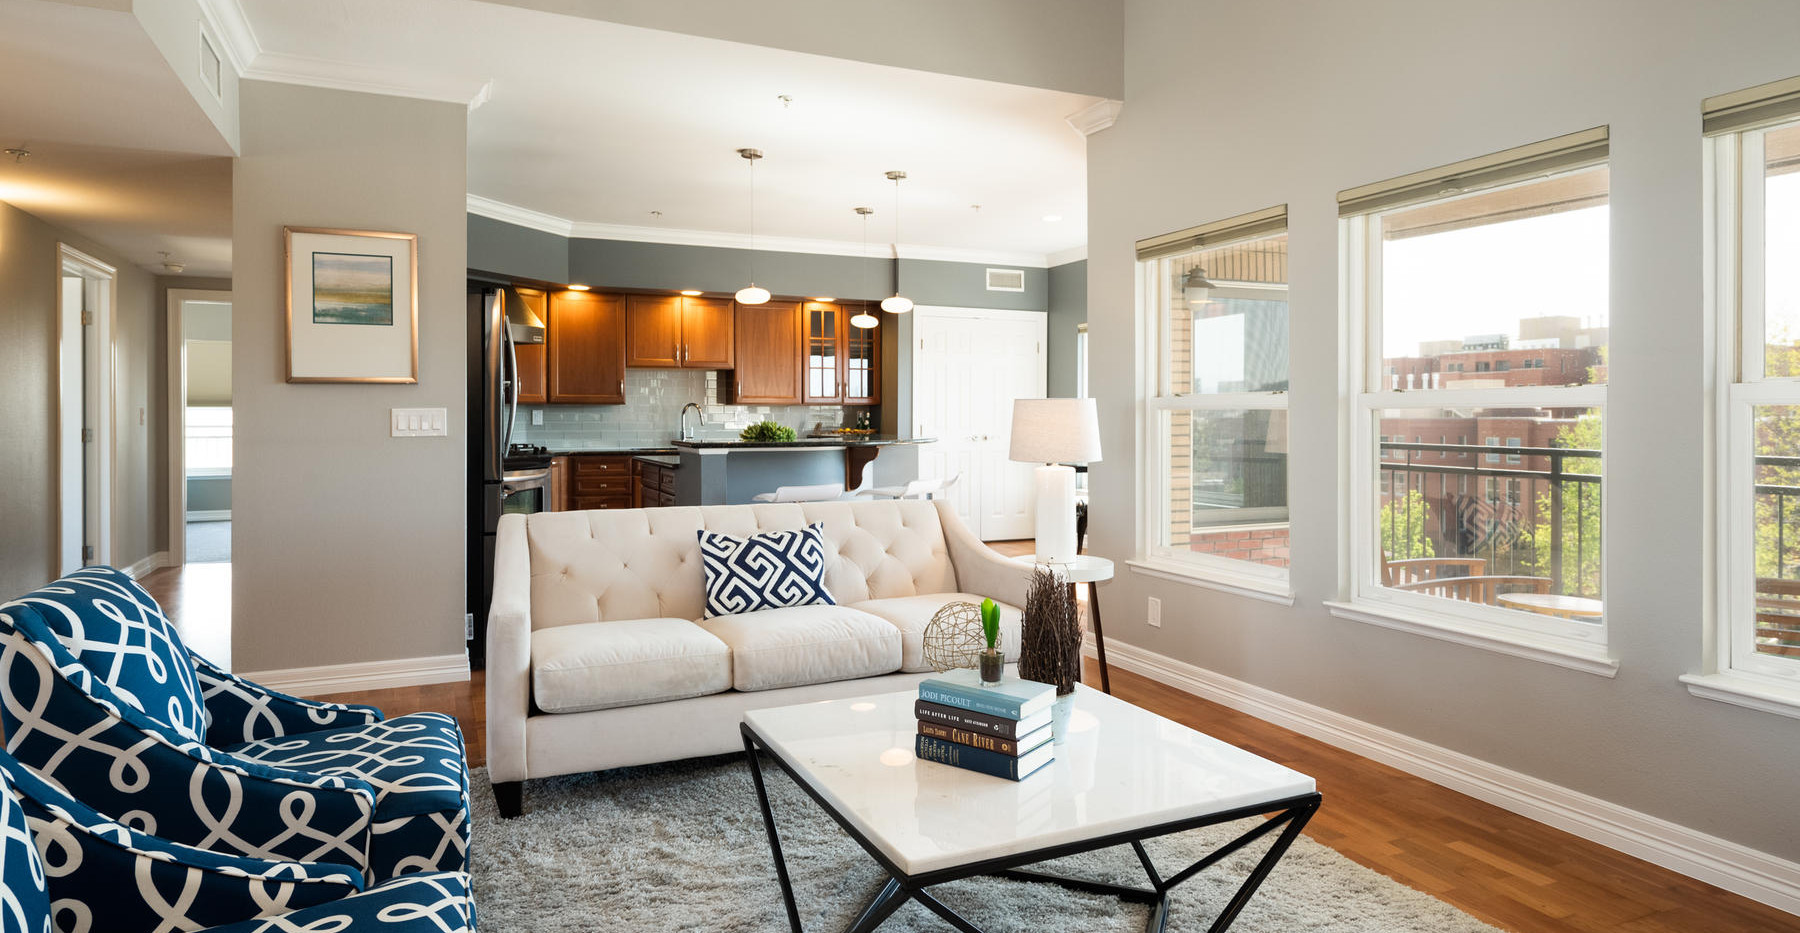 920 E 17th Avenue-030-043-Living Room-ML